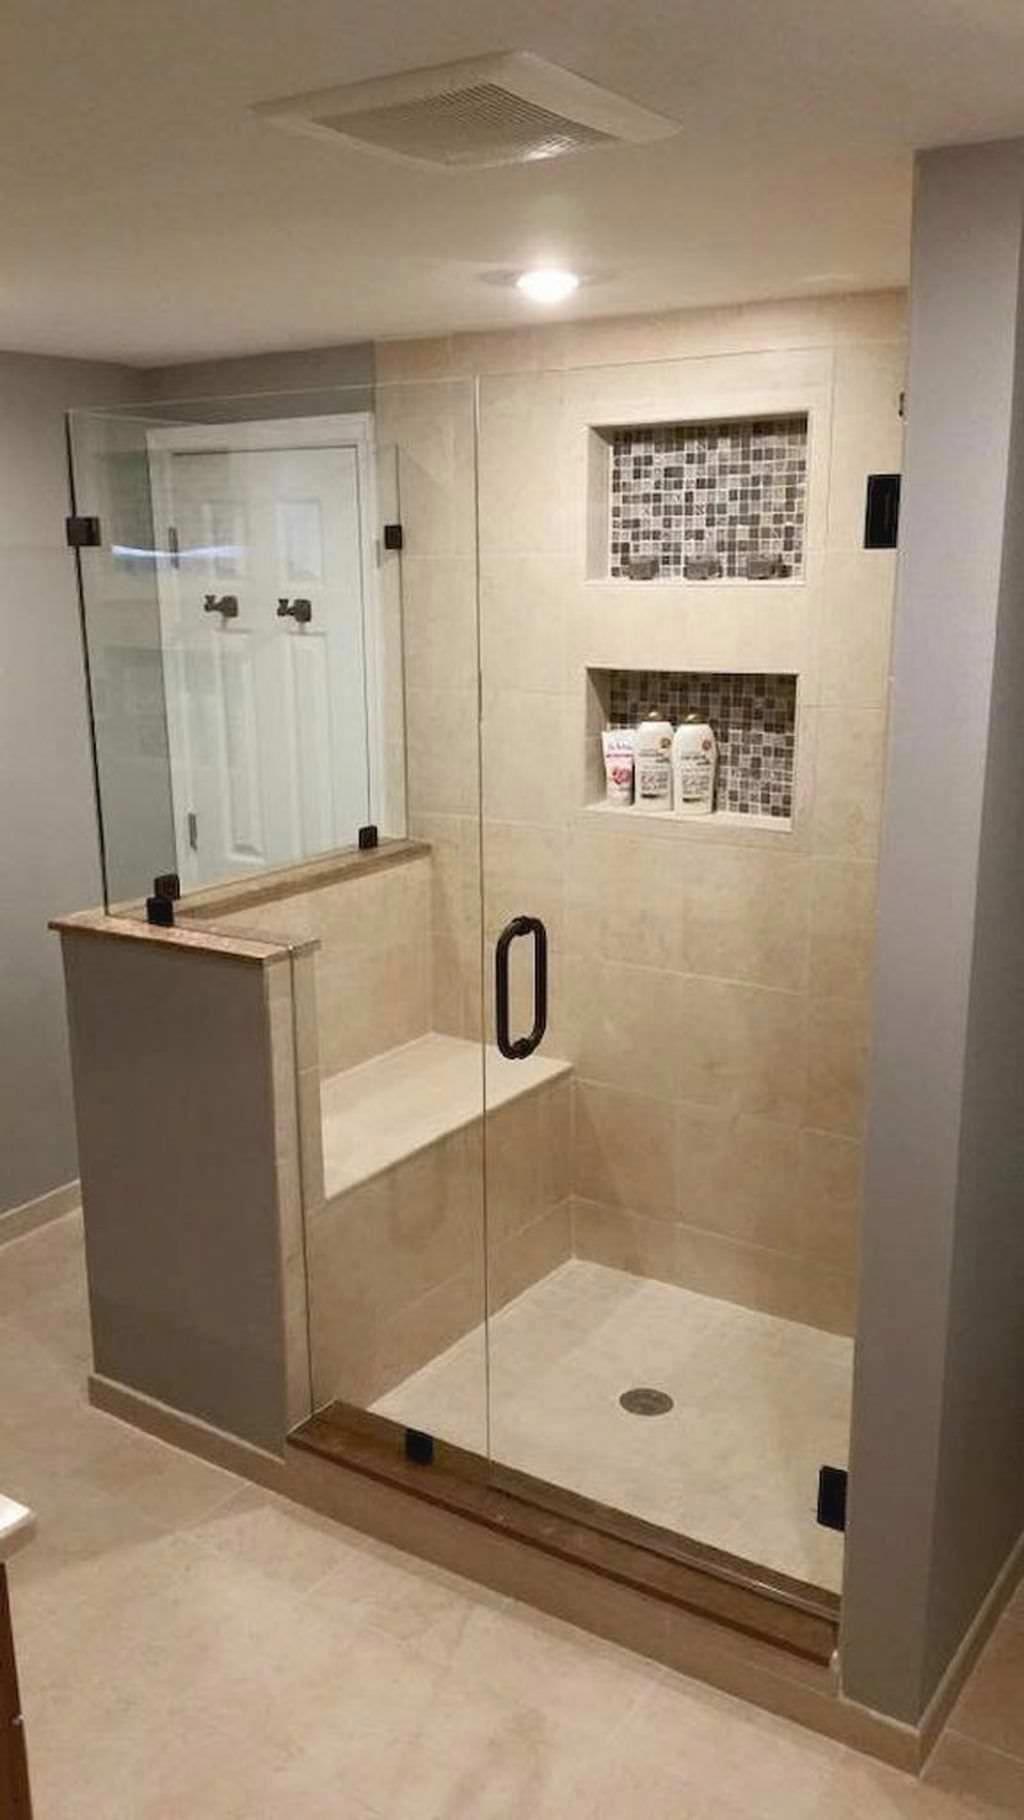 How To Choose A Toilet Nel 2020 Bagni In Muratura